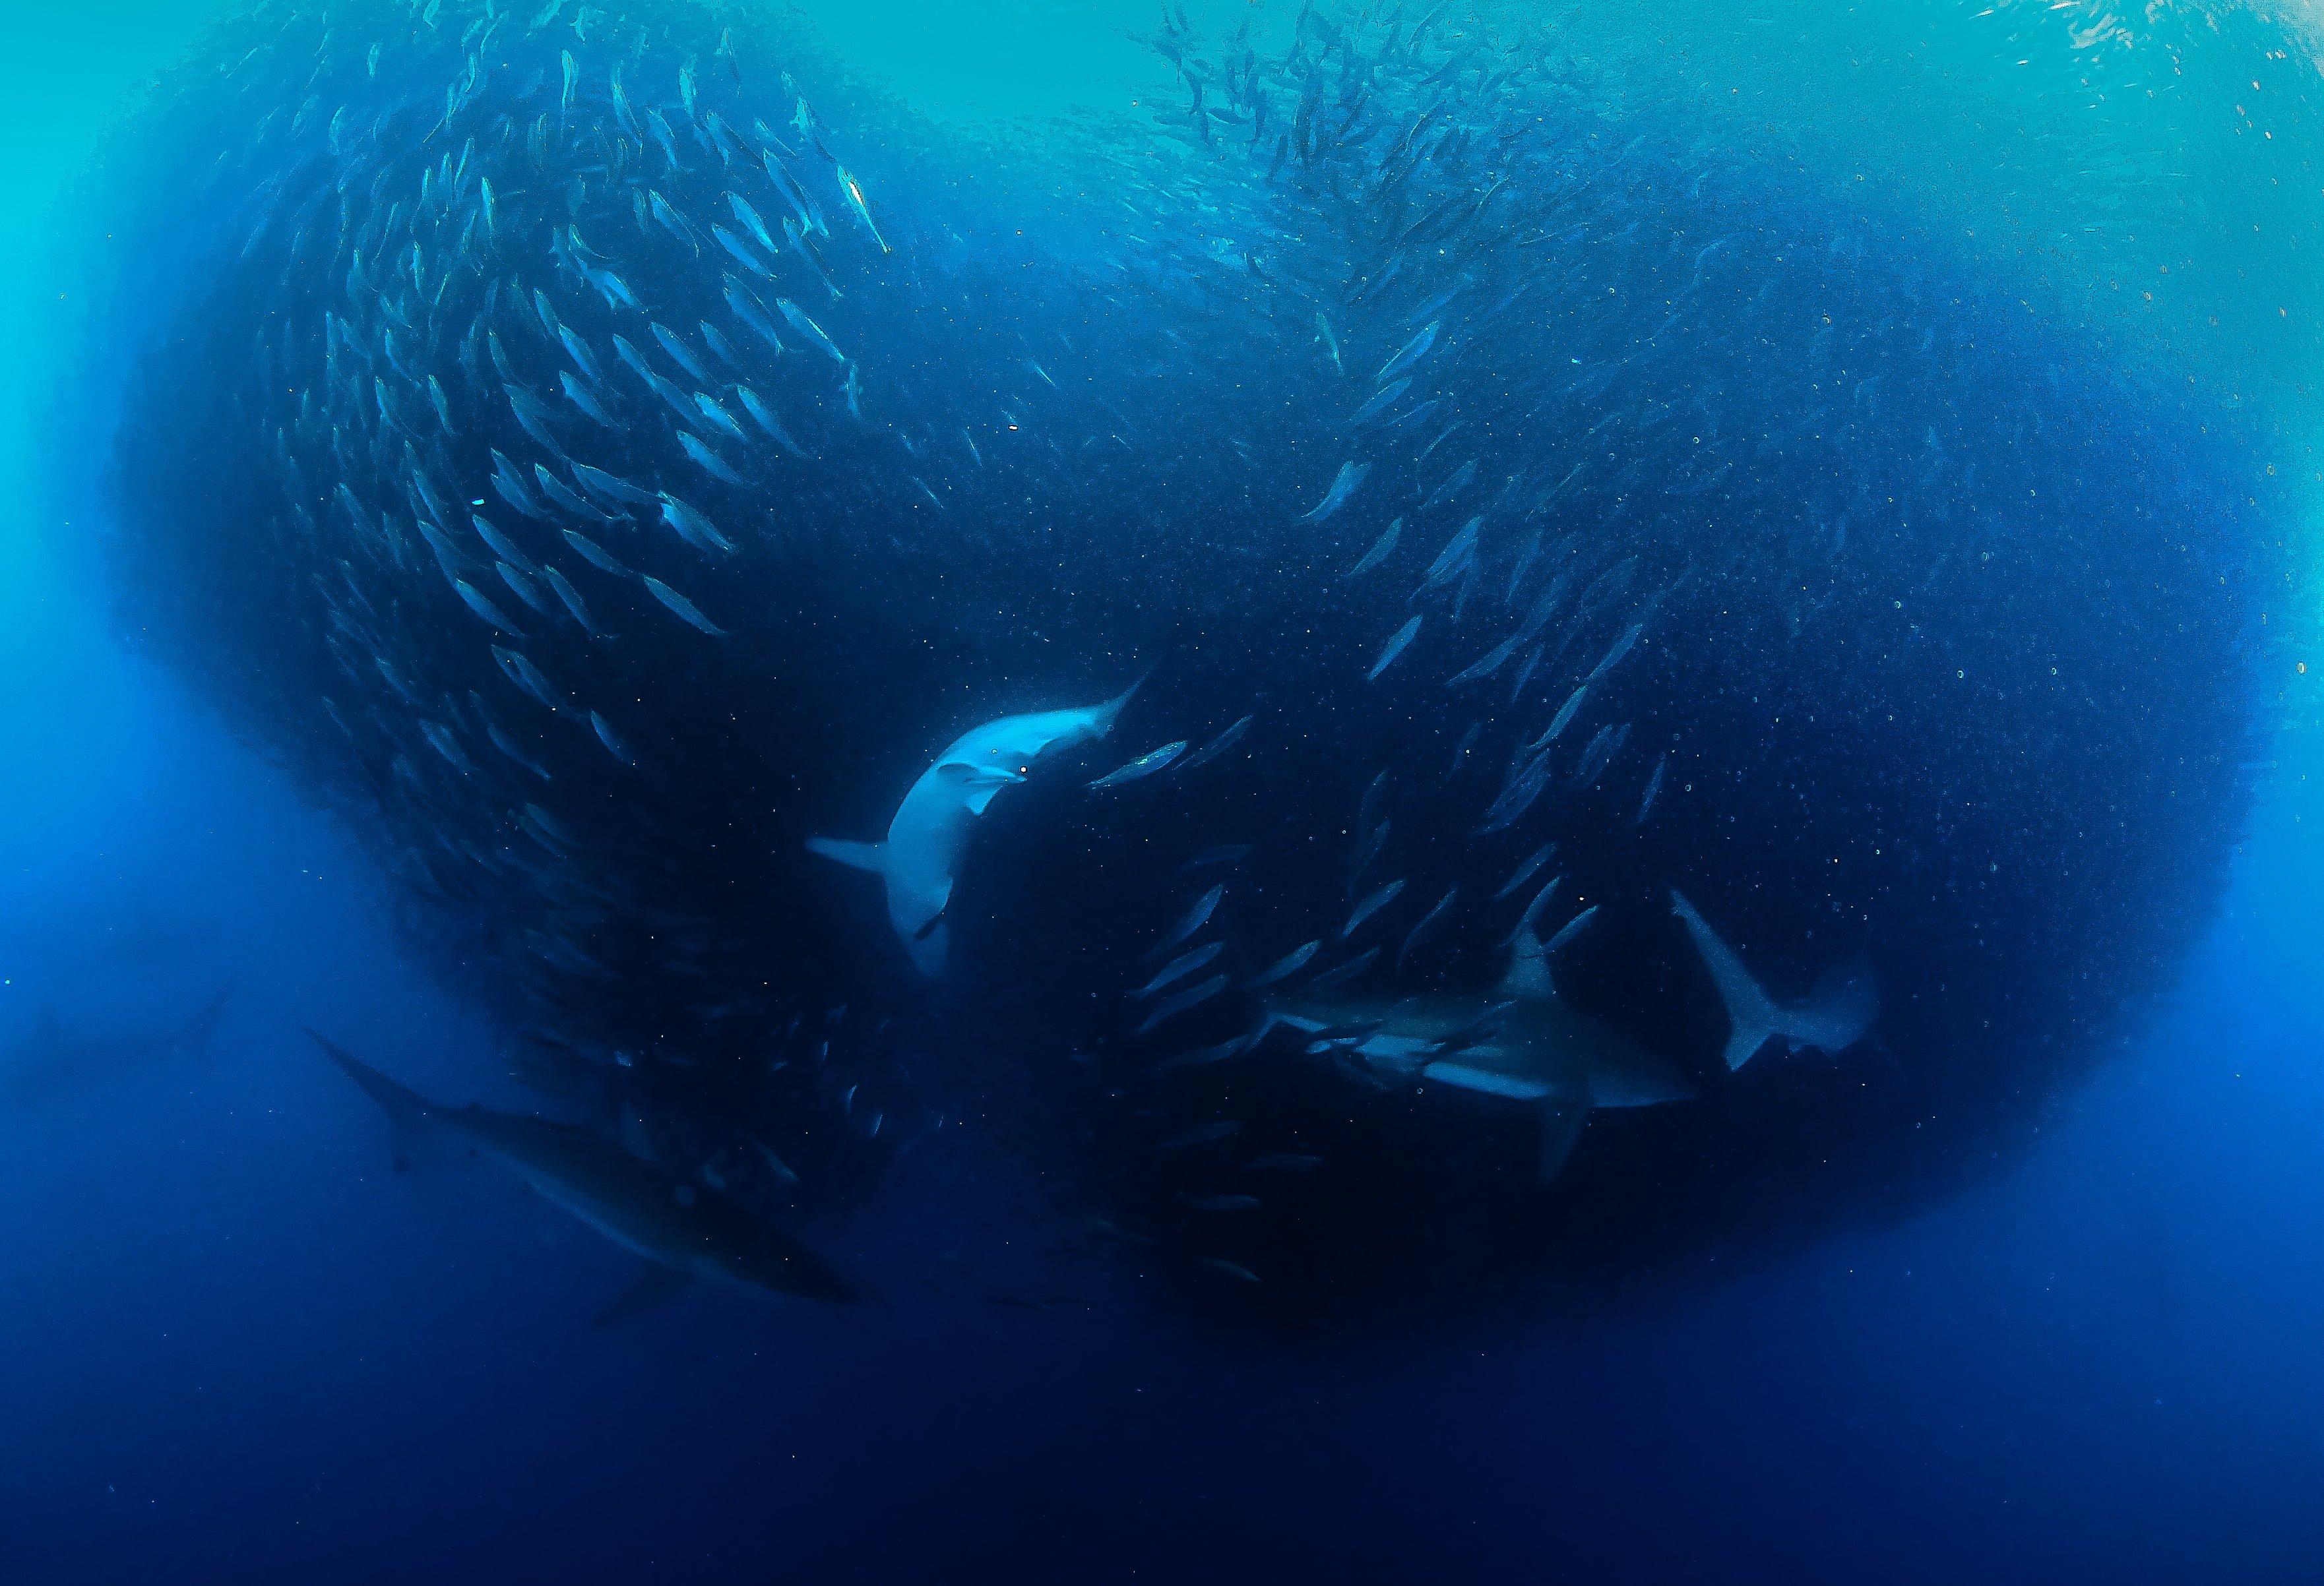 EGYPTE  Spécial dauphins de Mer Rouge